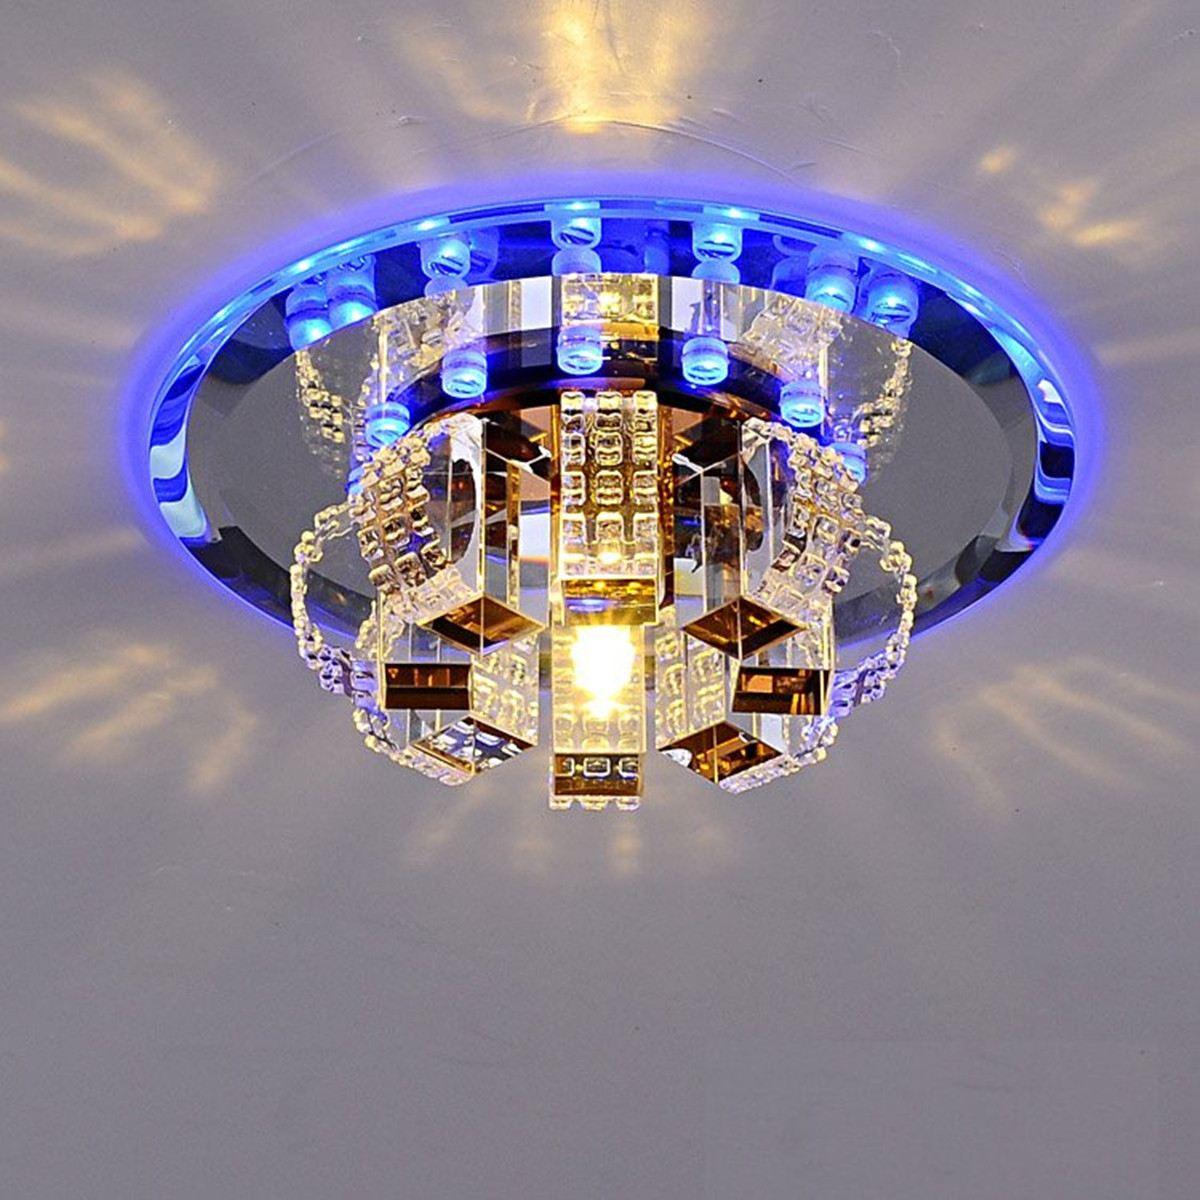 3W Modern Crystal LED Ceiling Light Fixture Home Decor AC220-240V